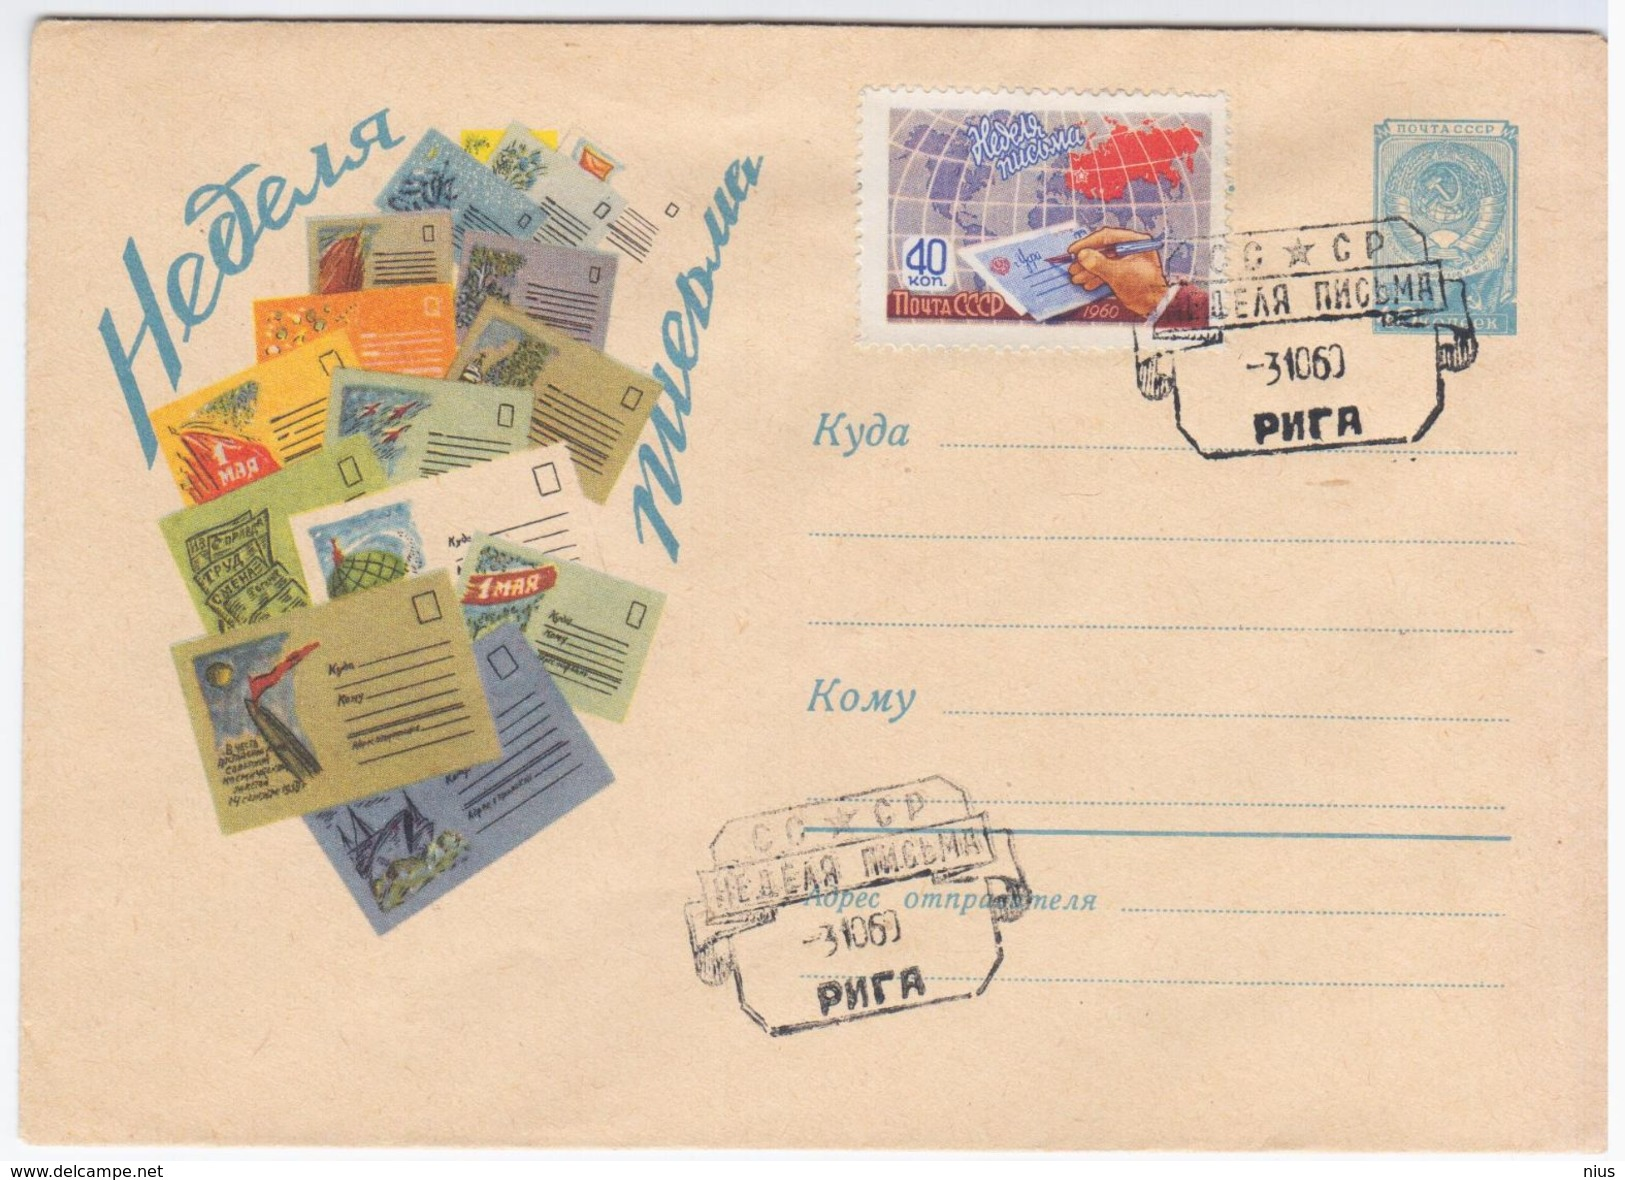 Latvia USSR 1960 Letter Week, Canceled In Riga - Latvia